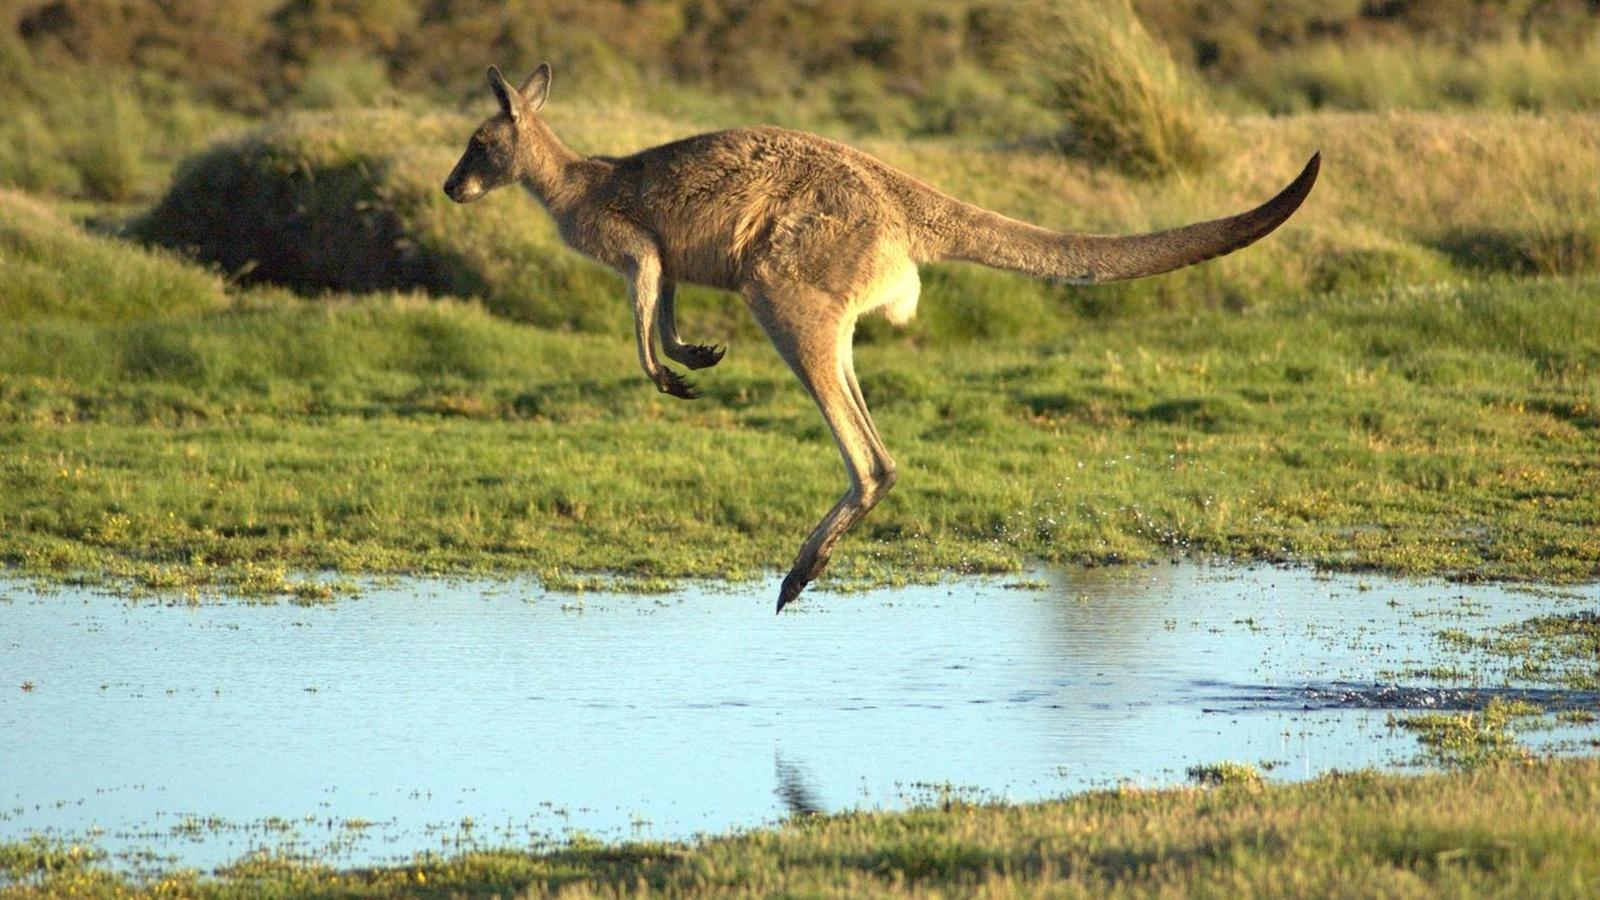 животные, кенгуру